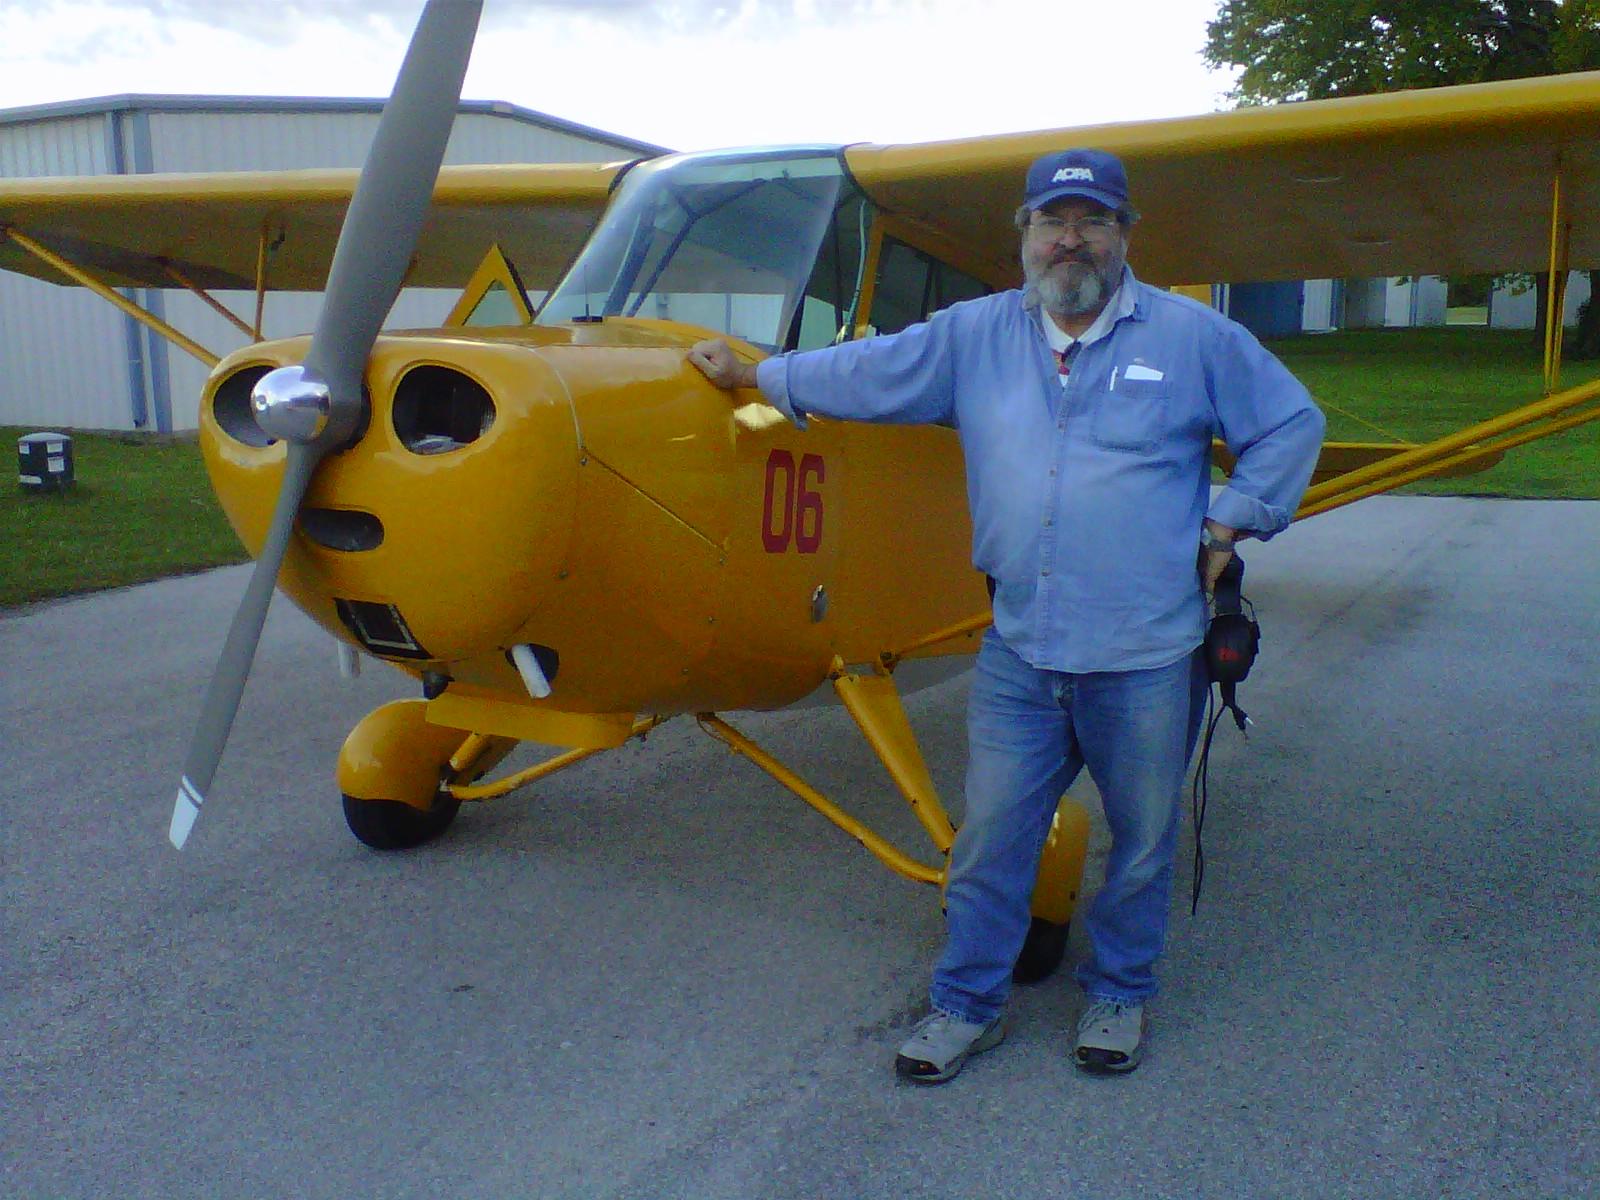 Rich Dugger: I'm no lady but I do fly a taildragger